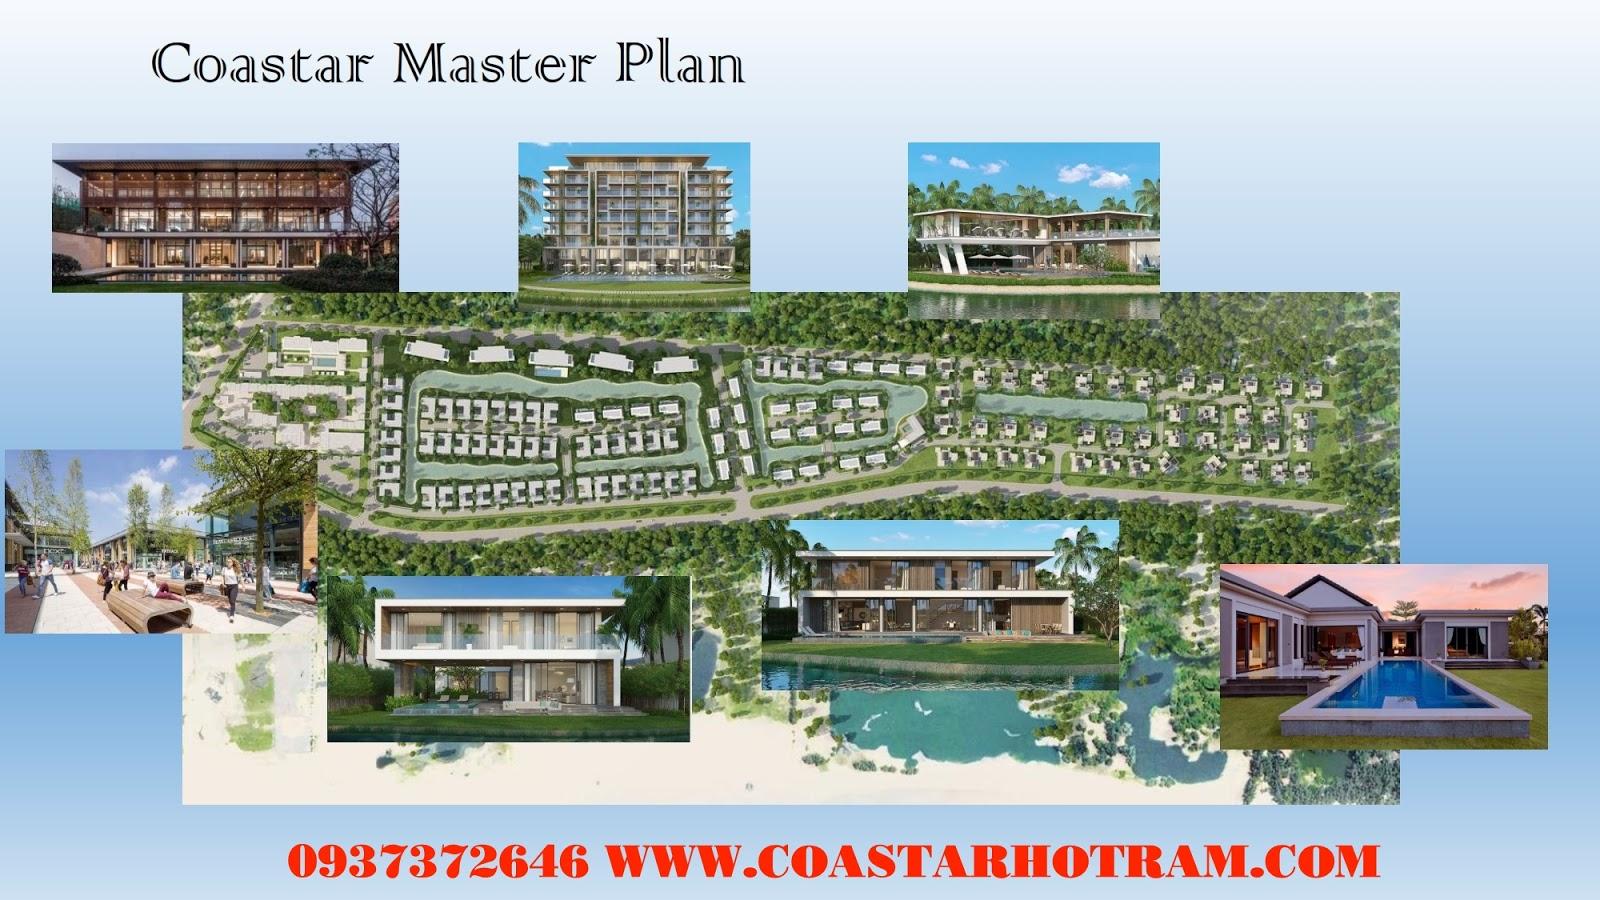 0937372646 WWW.COASTARHOTRAM.COM